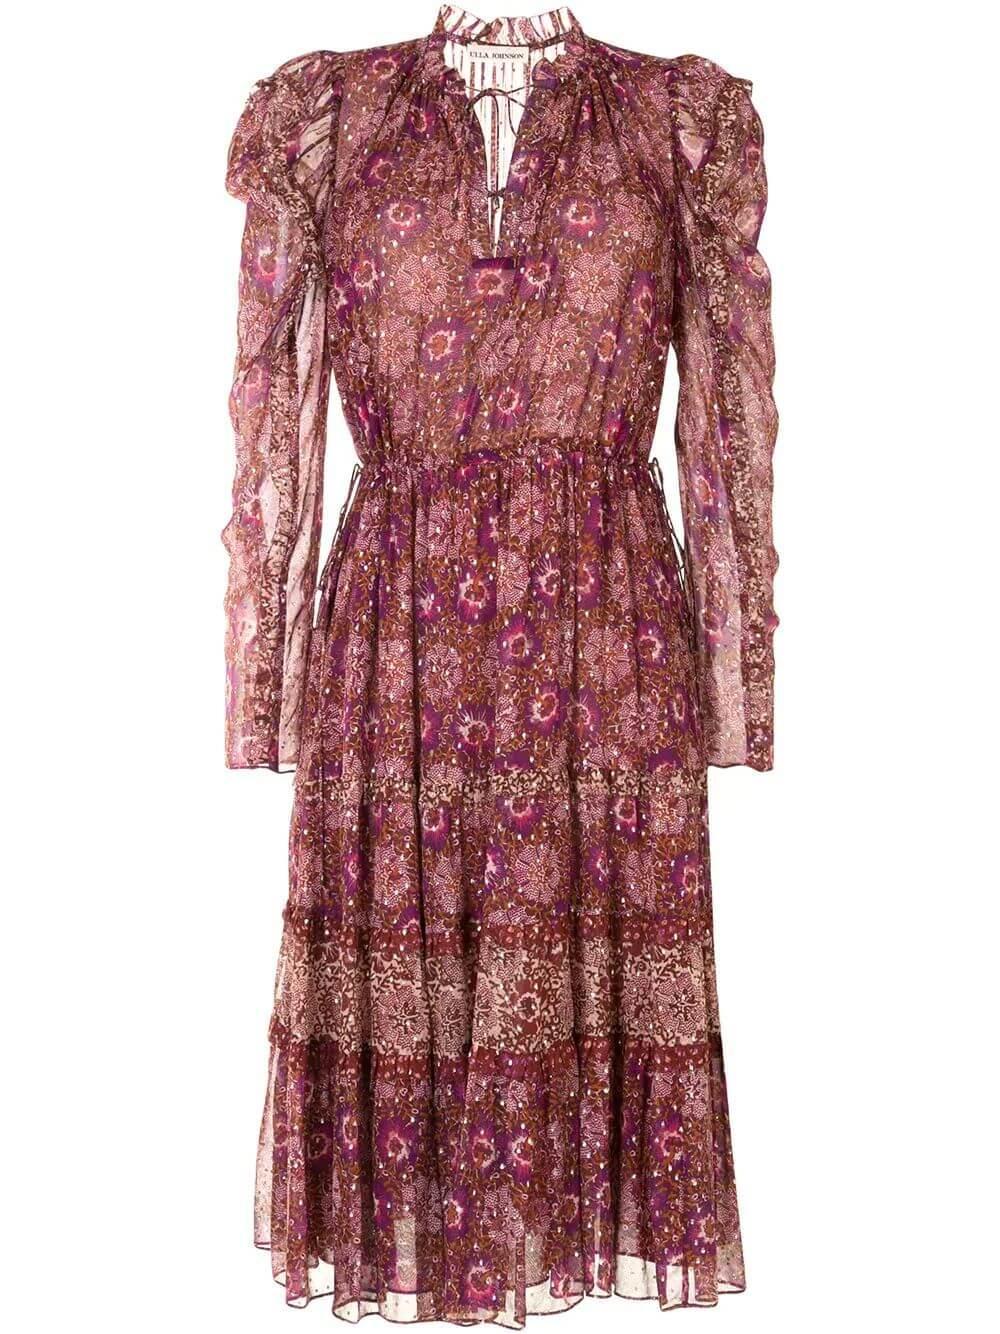 Alessandra Patchwork Dress